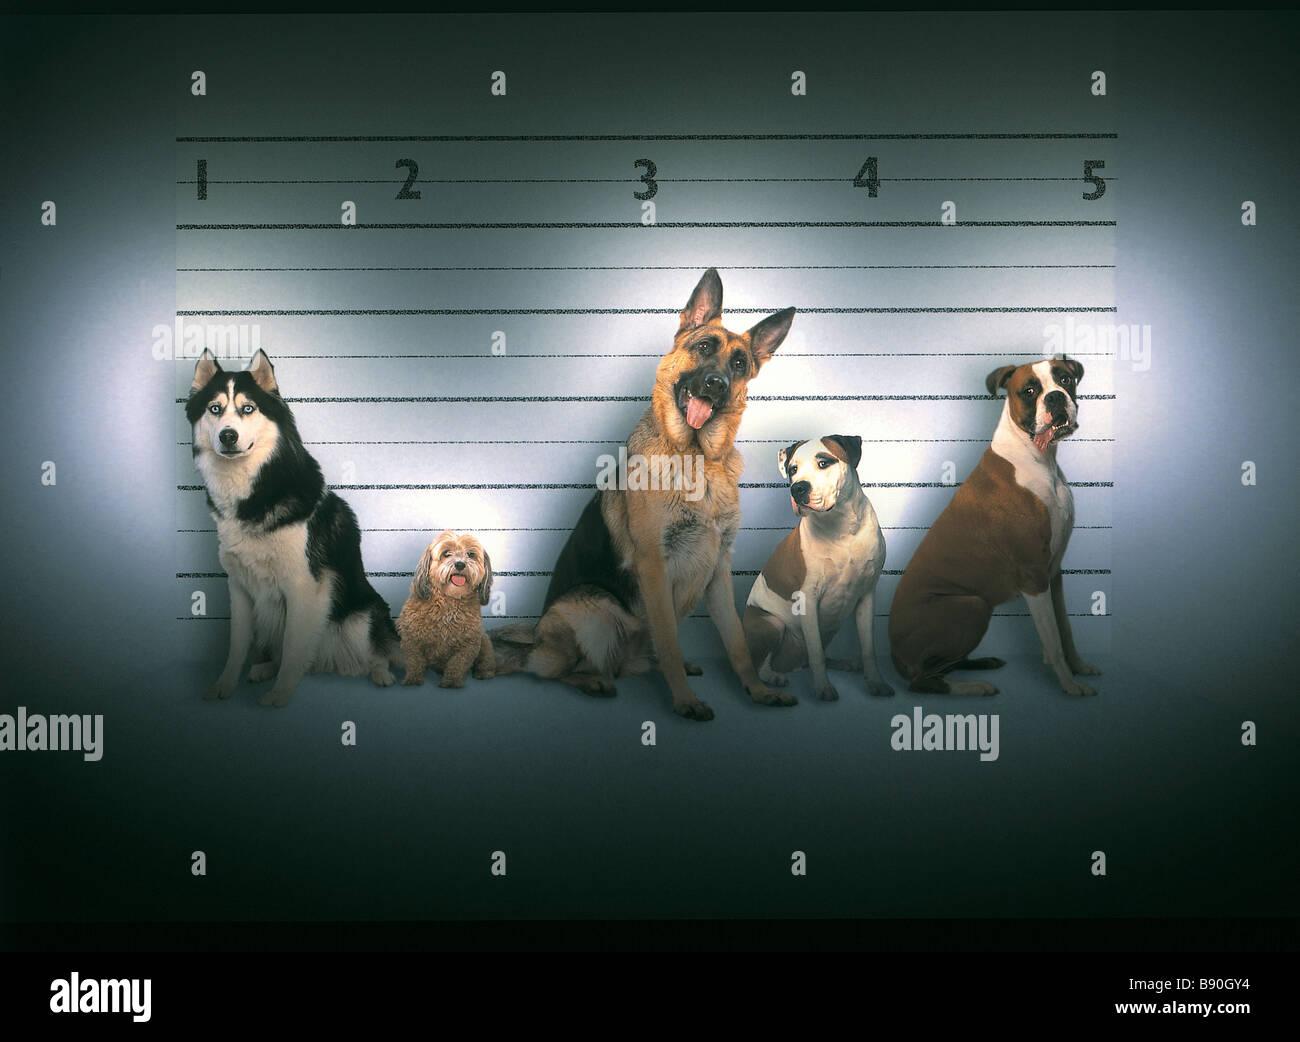 FL3053, KITCHIN/Hurst; line-up penal mal perros Imagen De Stock